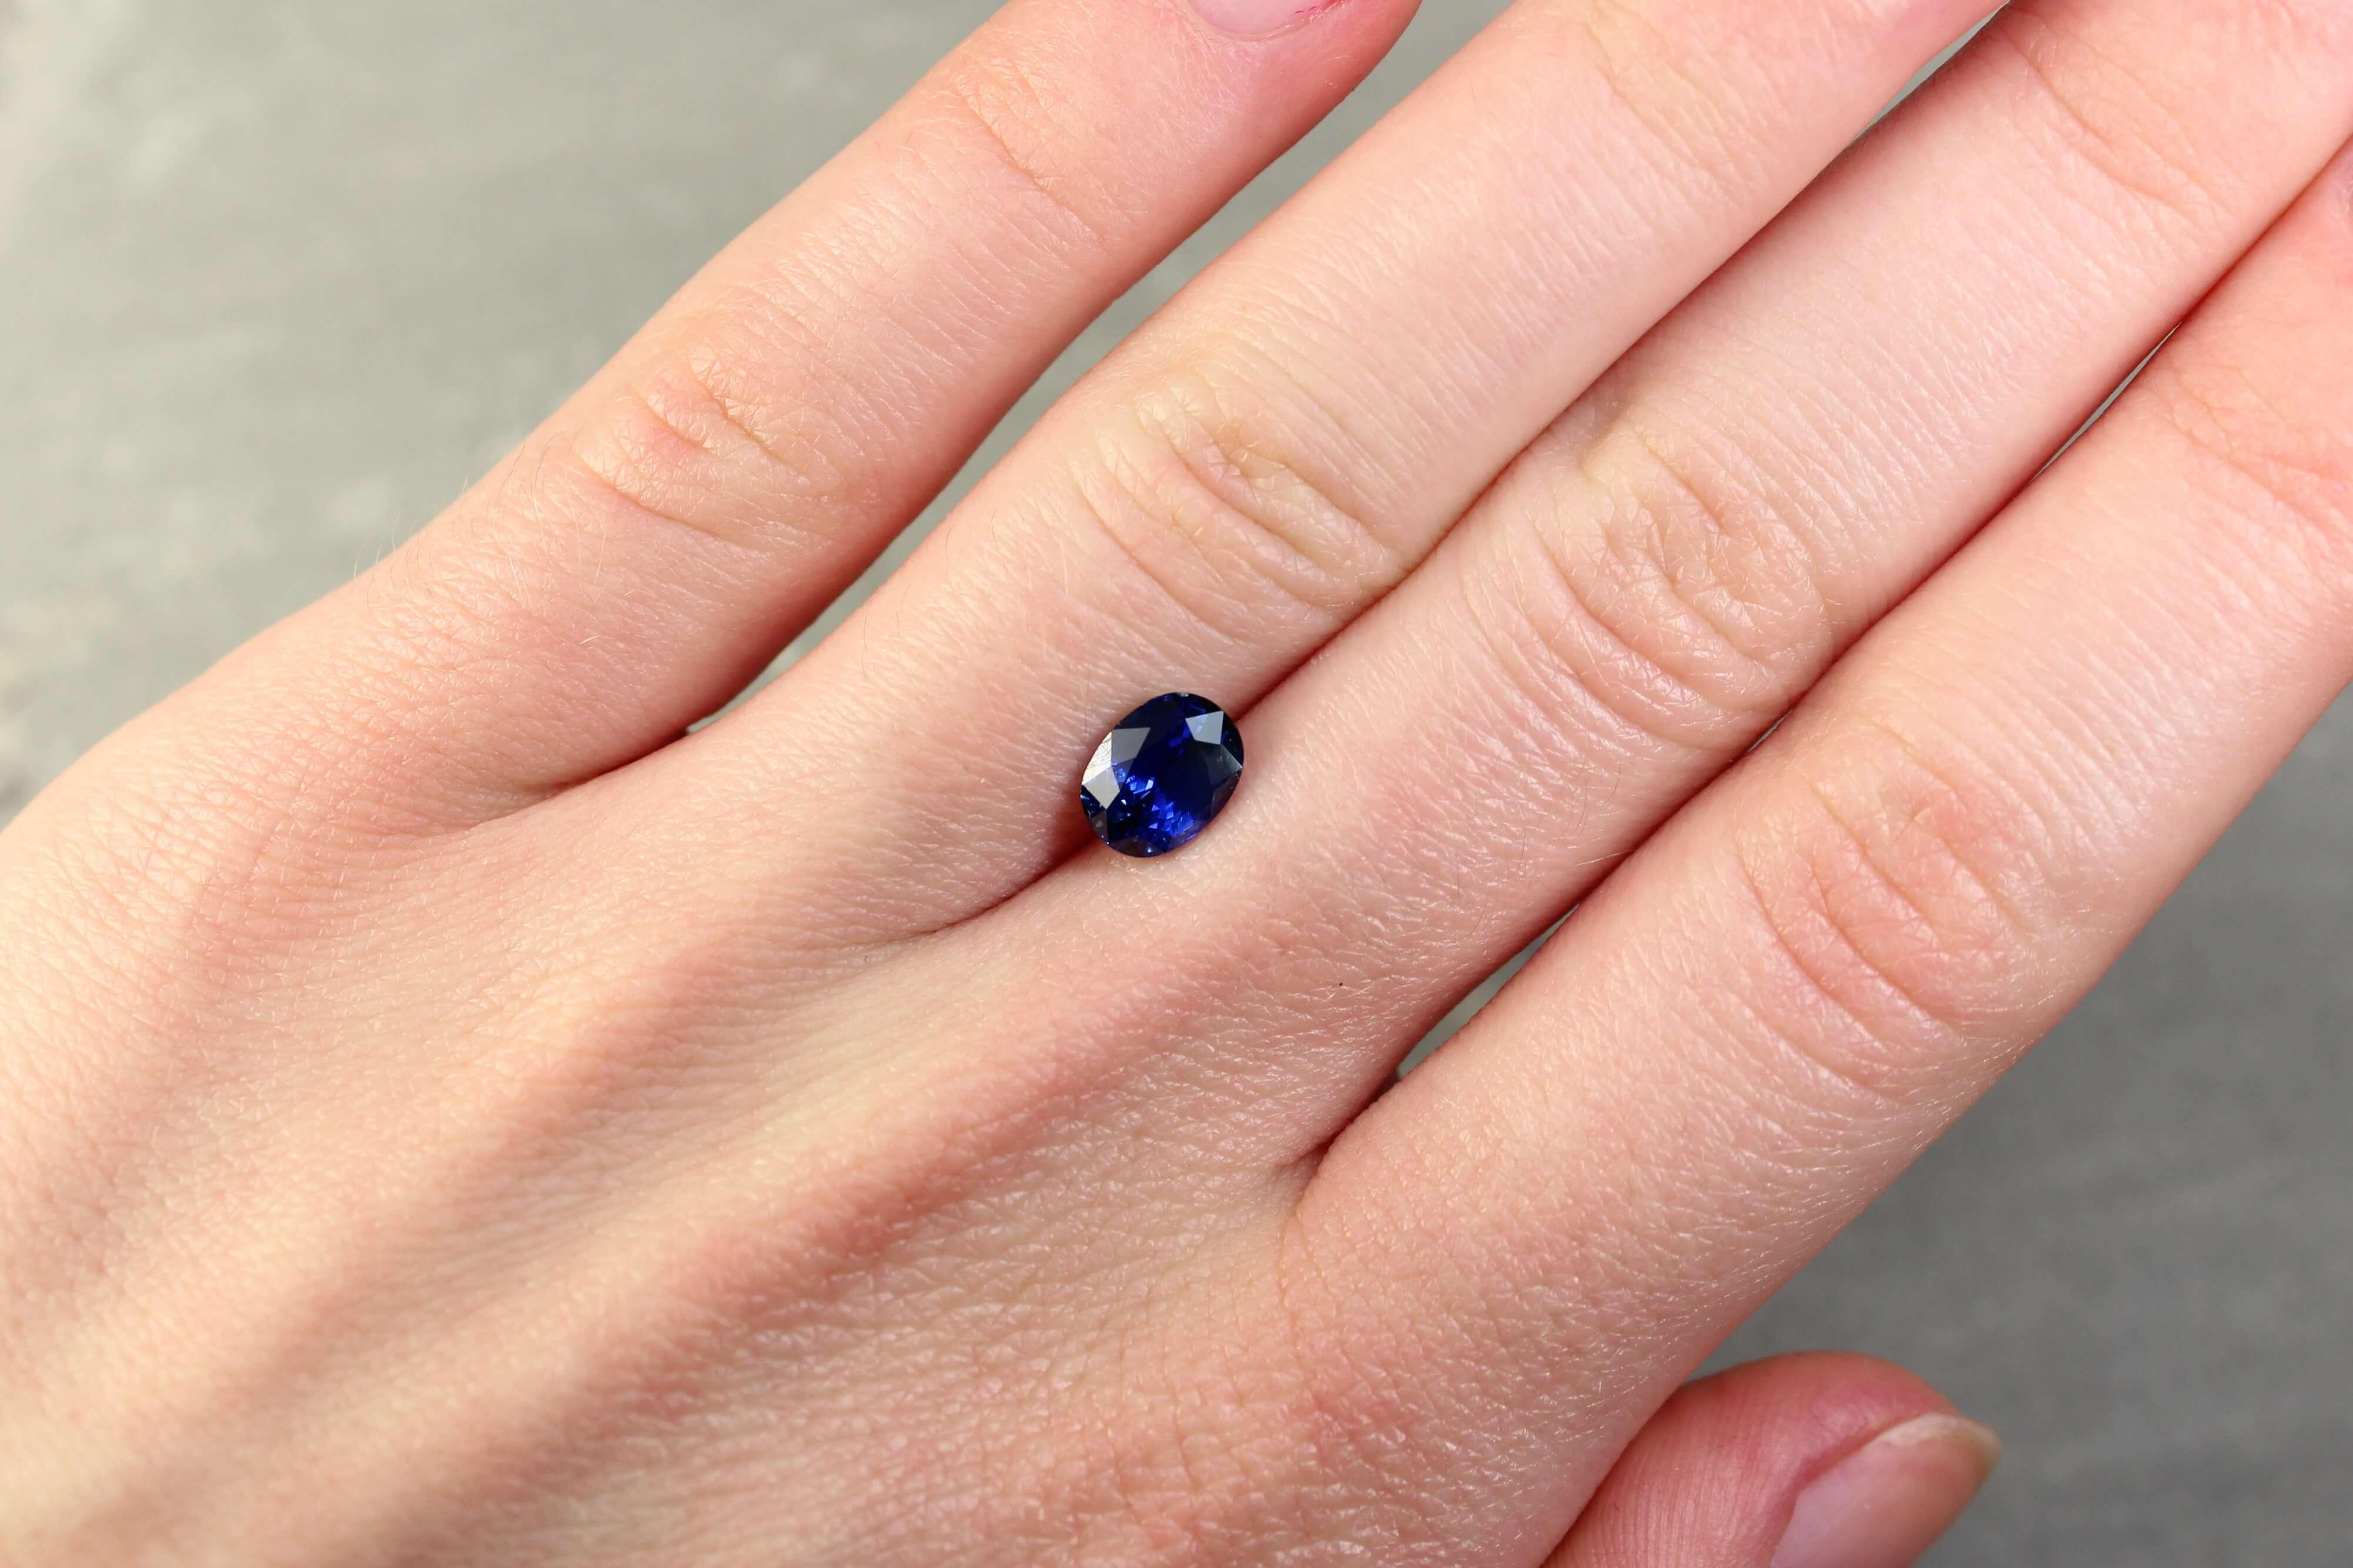 1.76 ct violetish blue oval sapphire